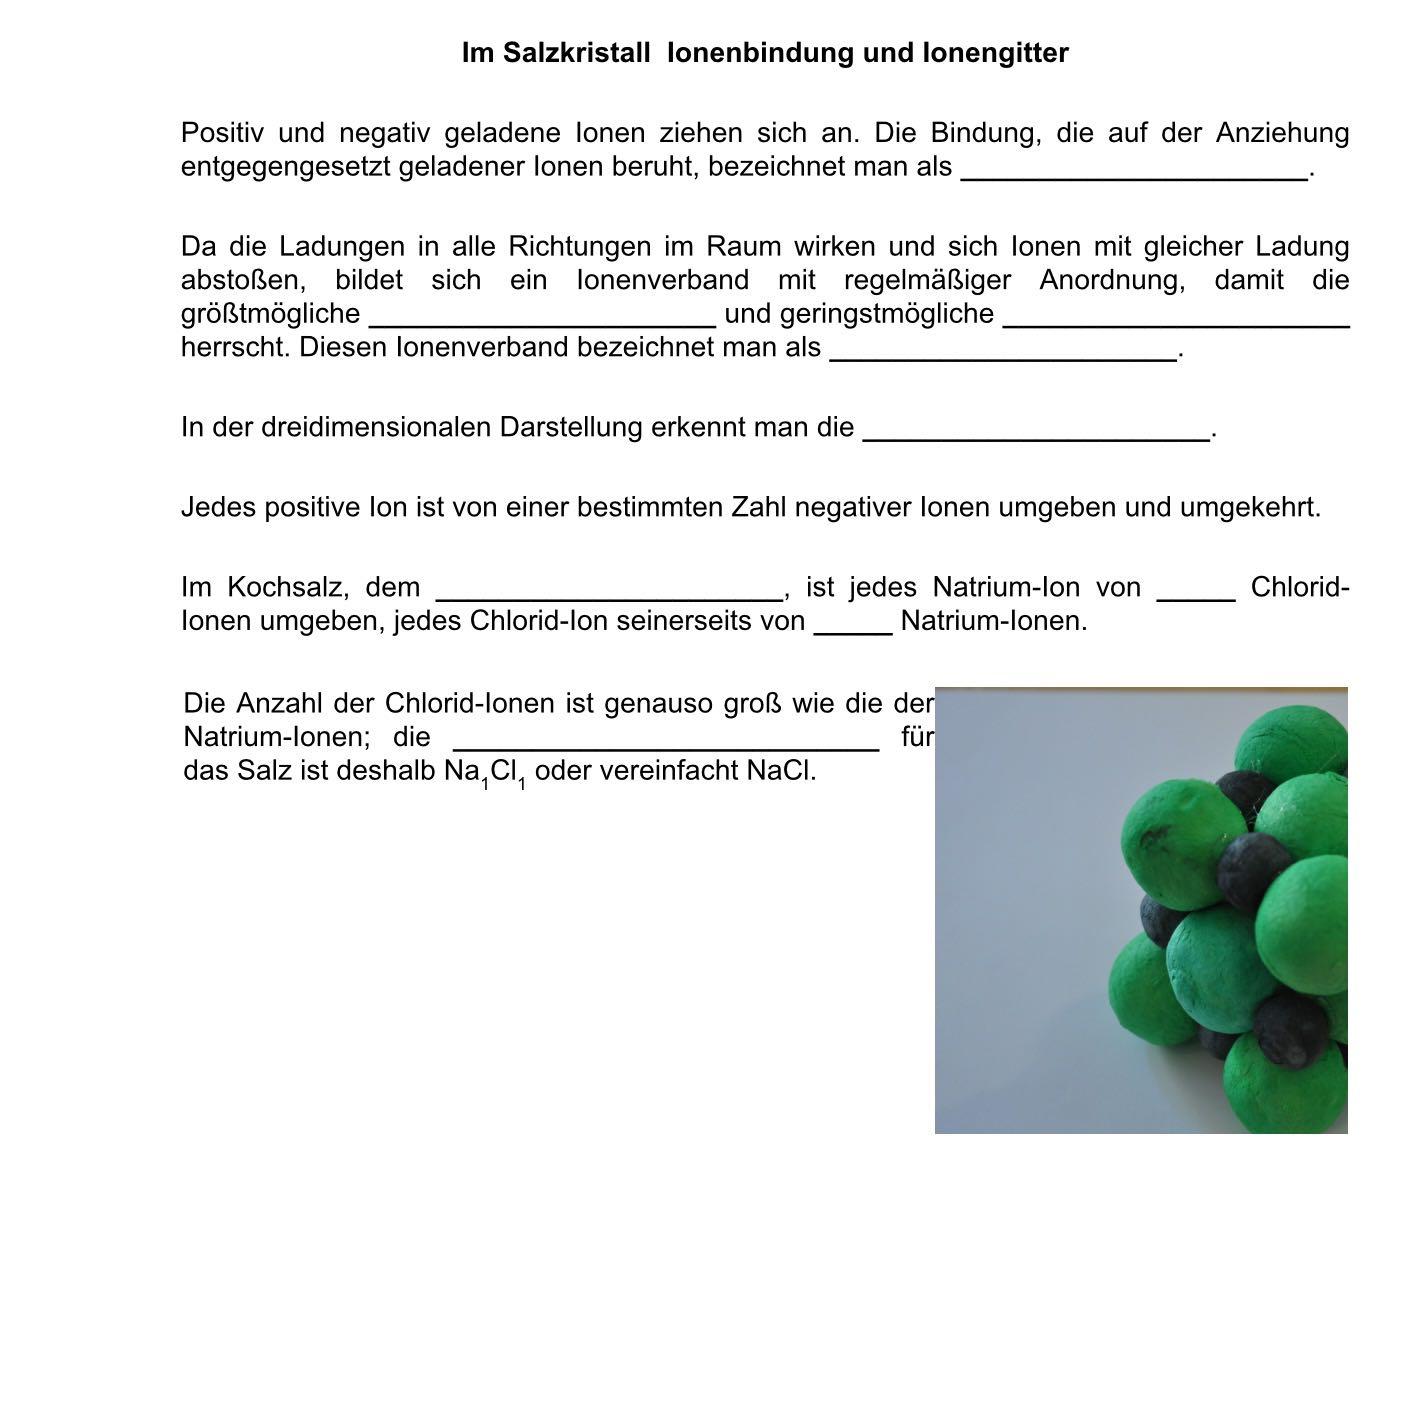 chemie Arbeitsblatt lösen(Lückentext-Im Salzkristall...)? (Salz ...